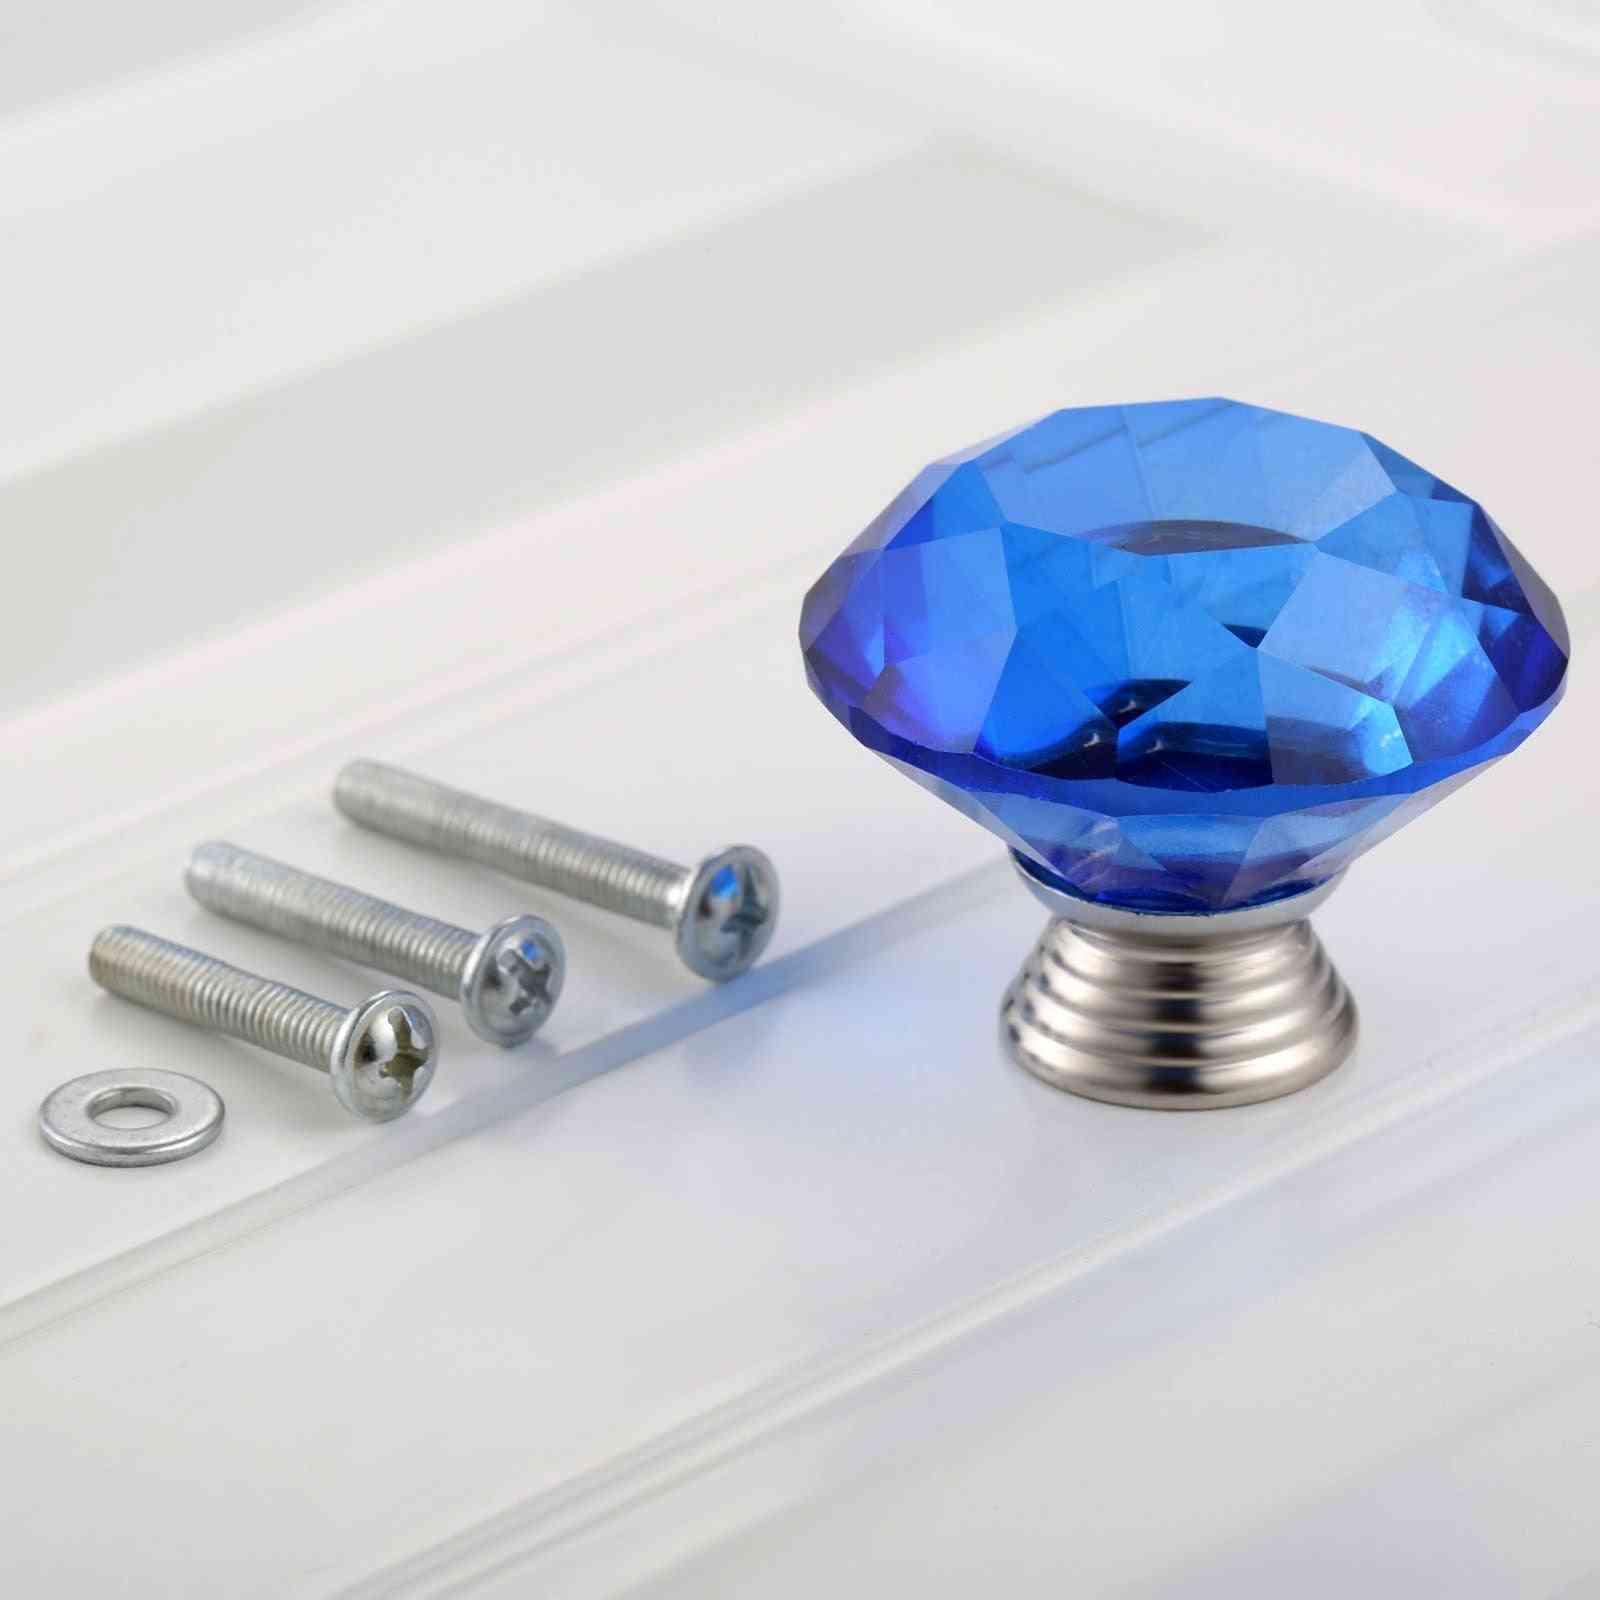 Crystal Glass Knob - Pull Handle Door Cabinet, Furniture Hardware